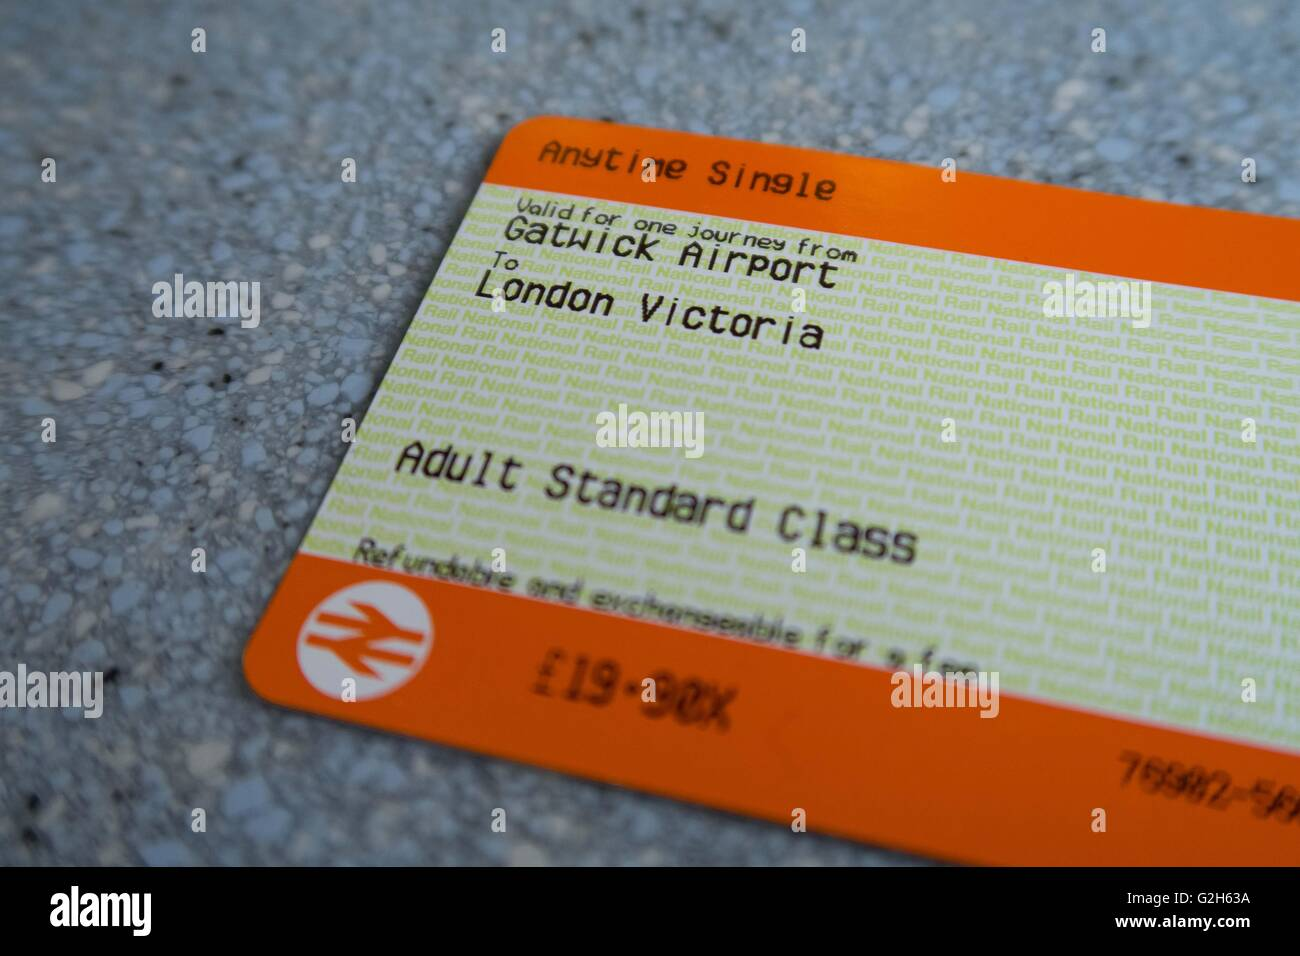 virgin train booking